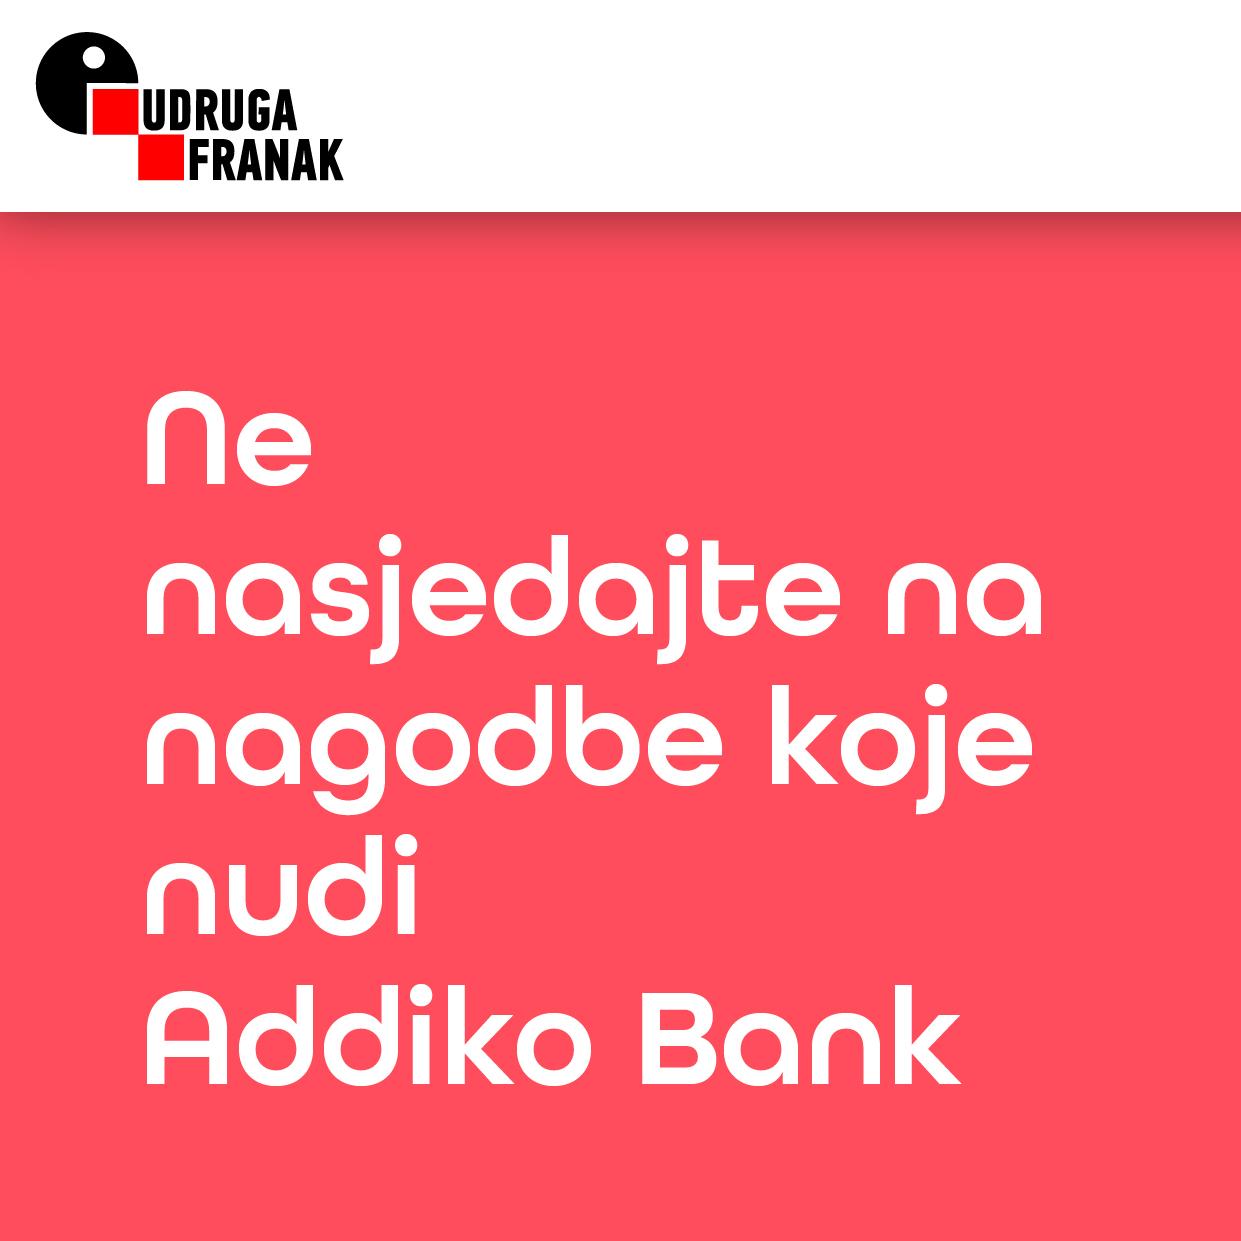 UF - Addiko2-02